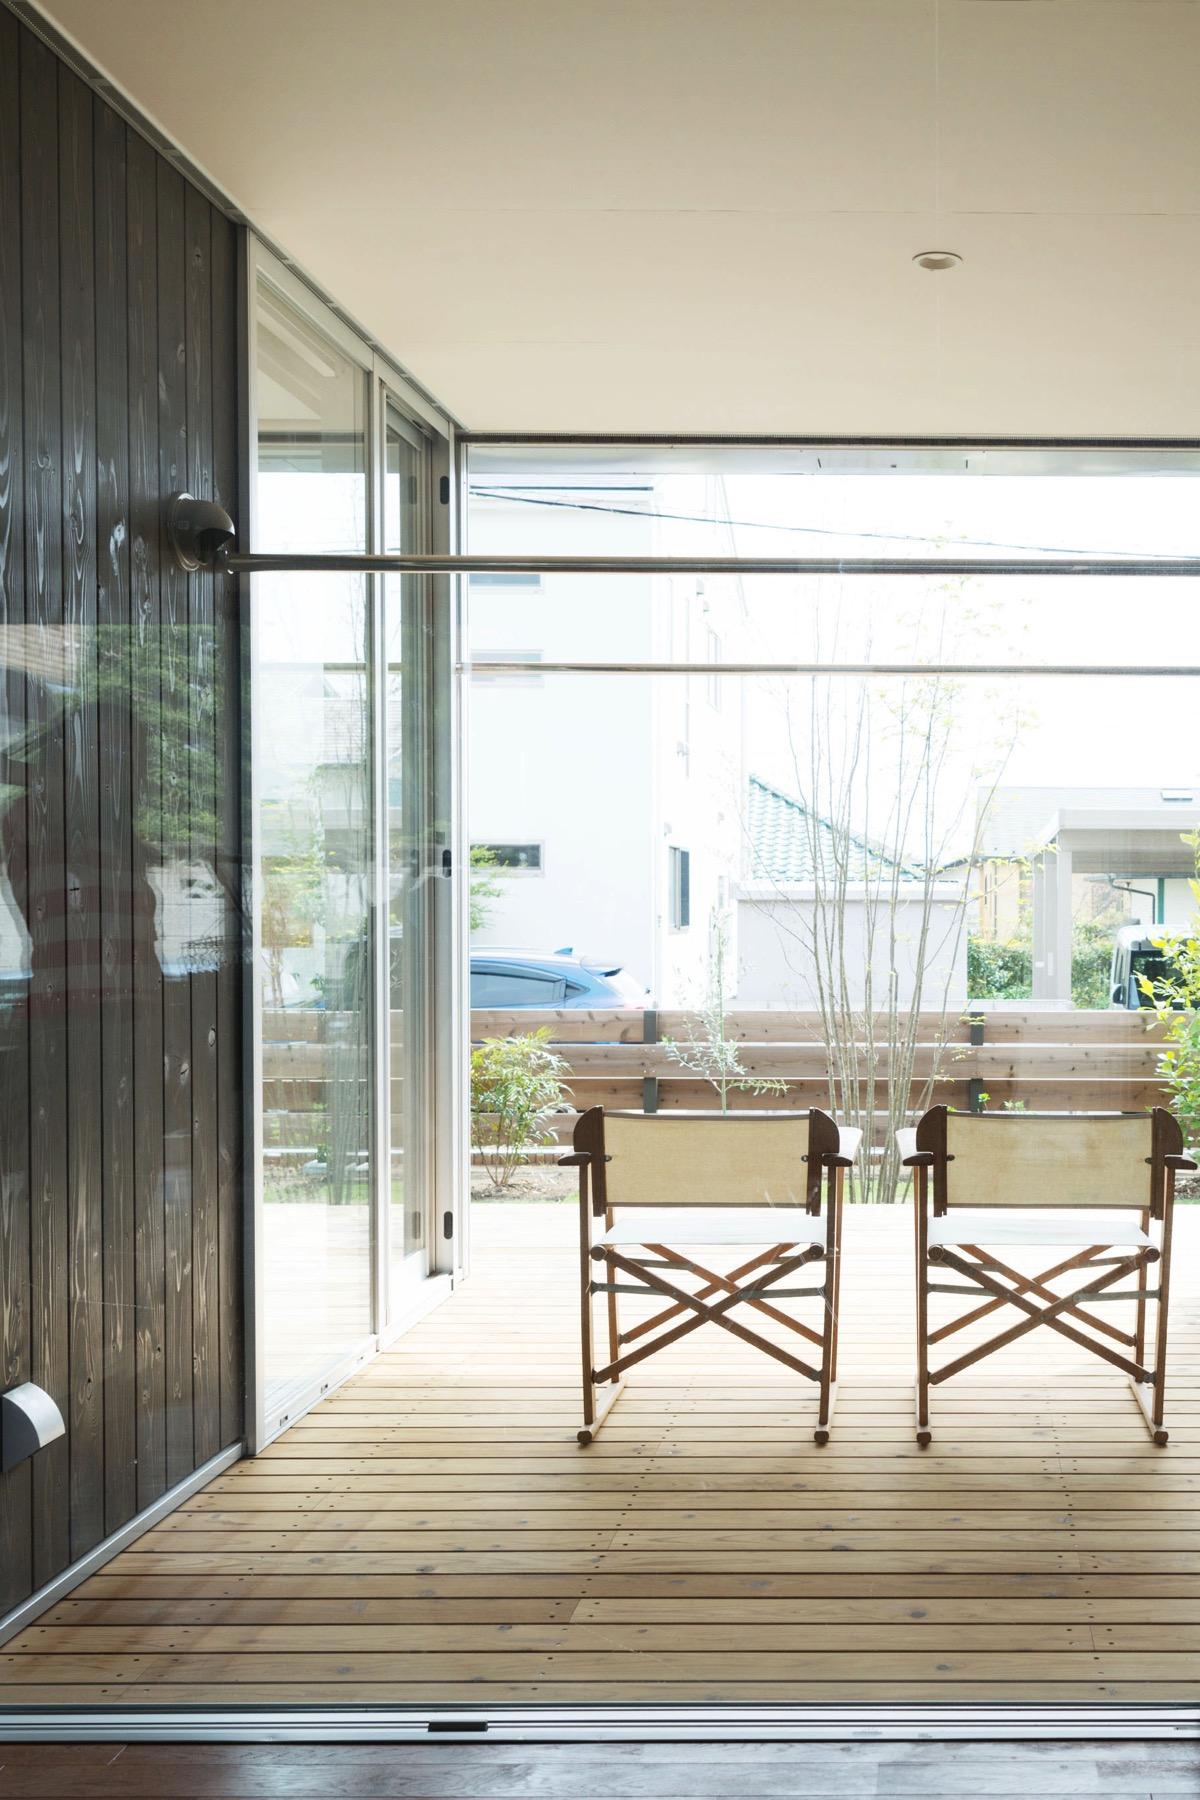 Residence_Kugenuma_Kanagawa 2016